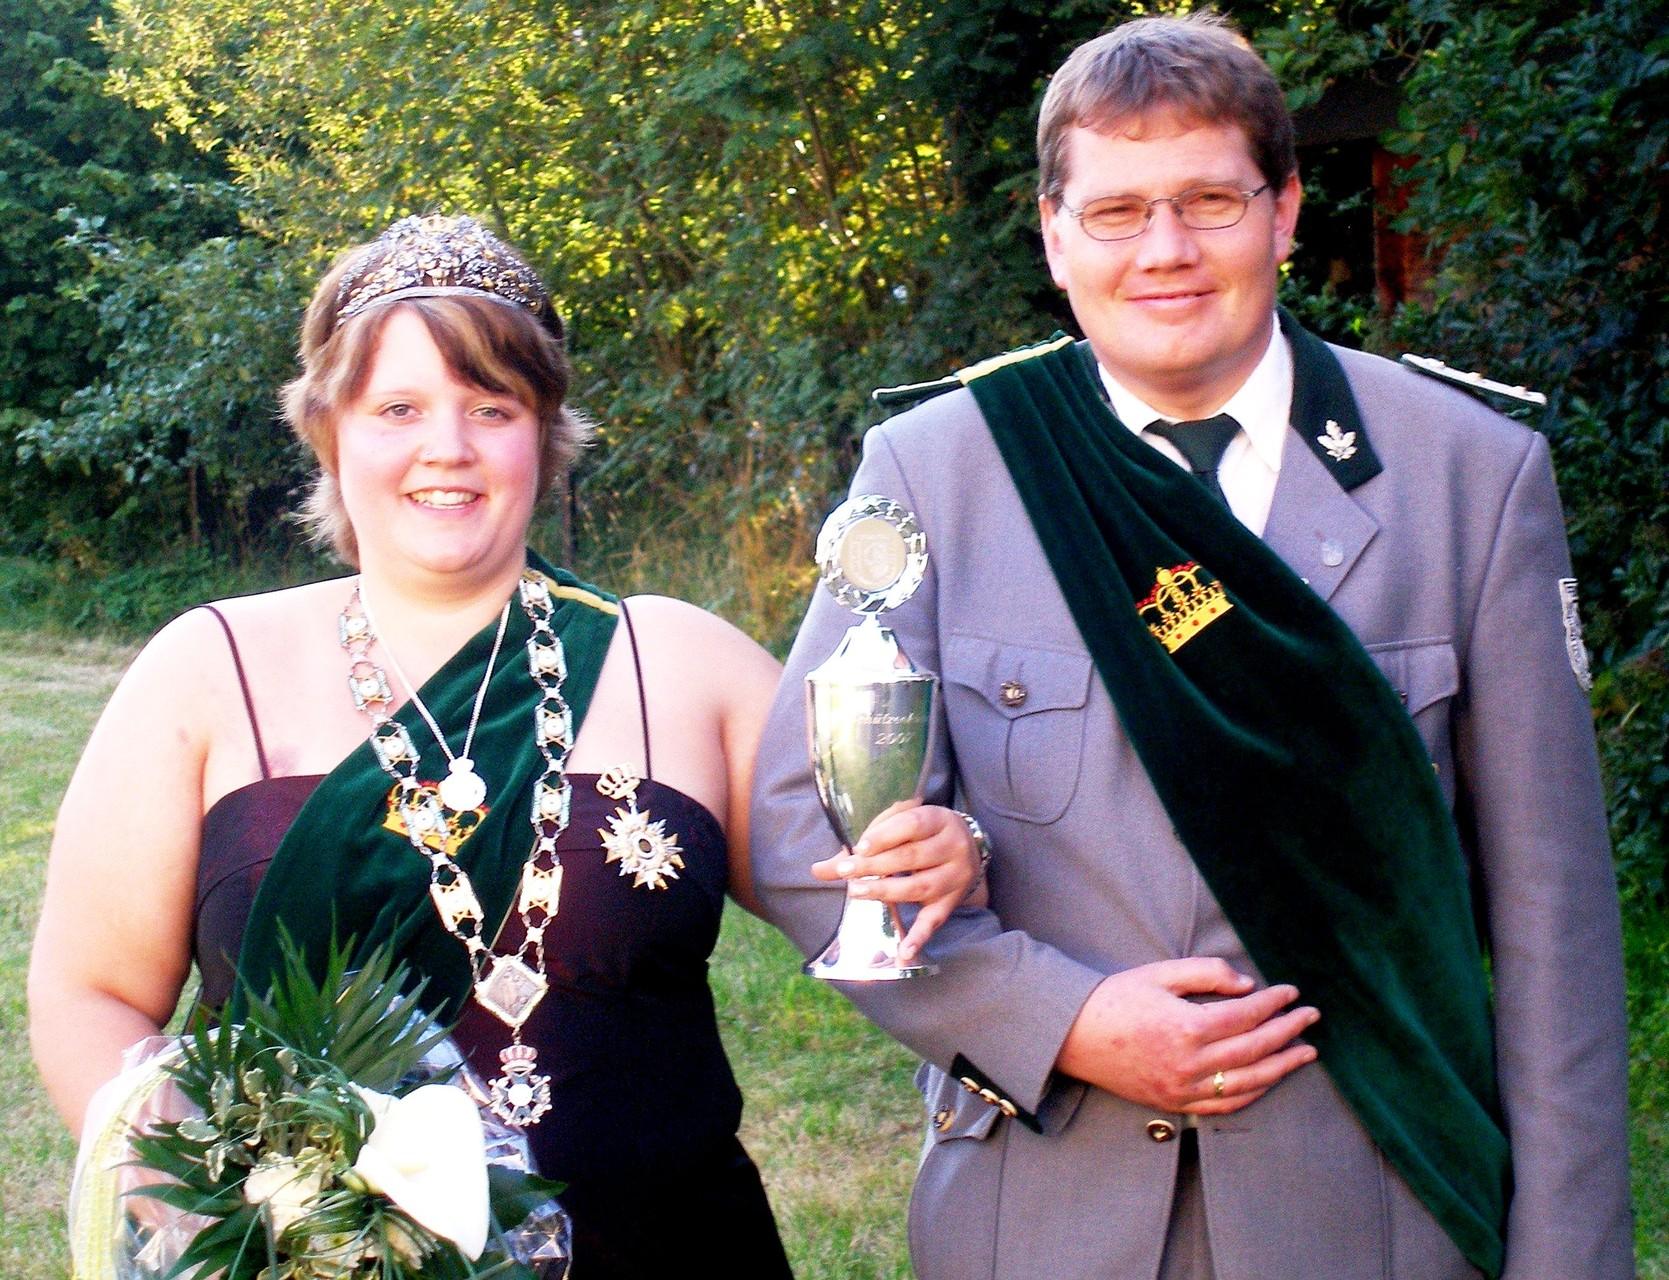 Schützenkönigspaar 2007: Jennifer Bald und Prinzregent Wolfgang Dickel